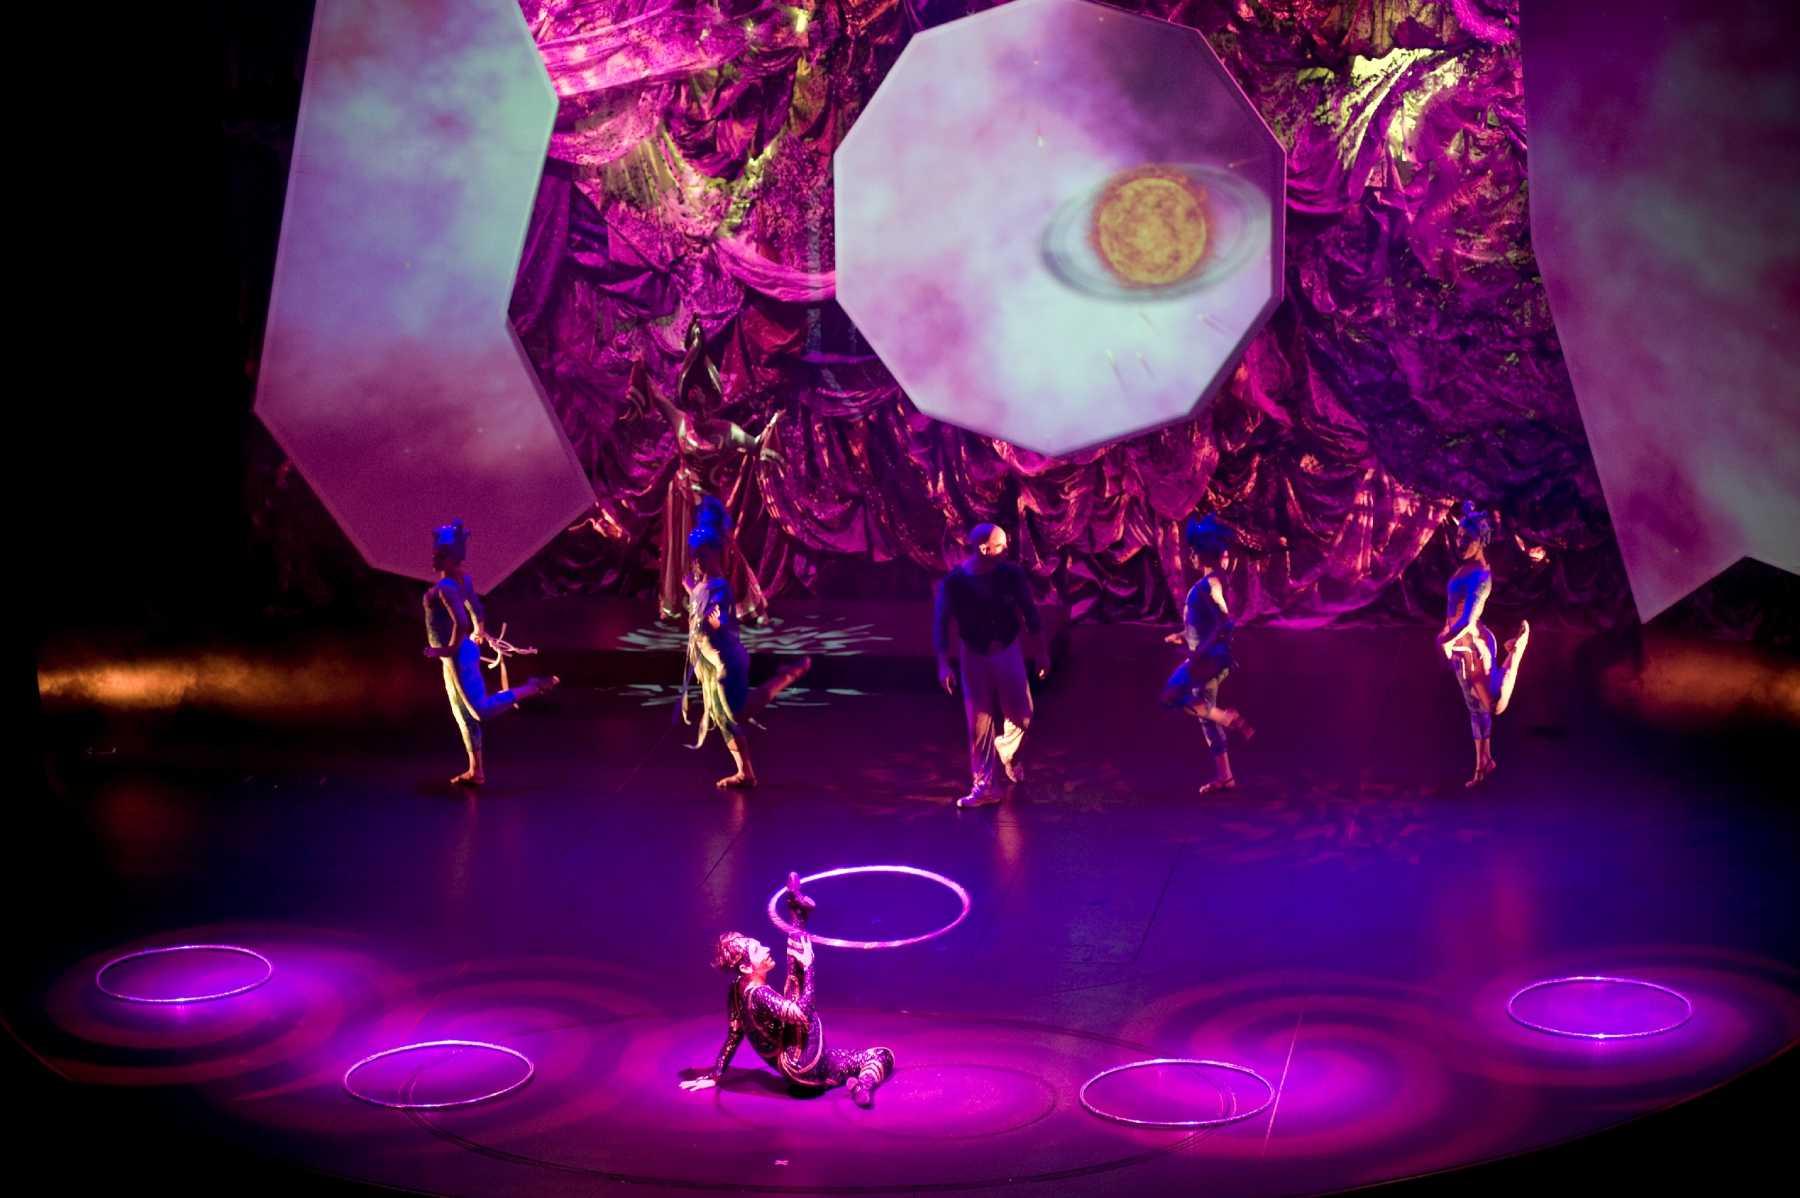 celebrity cruises theatre performance unknown 1.jpg